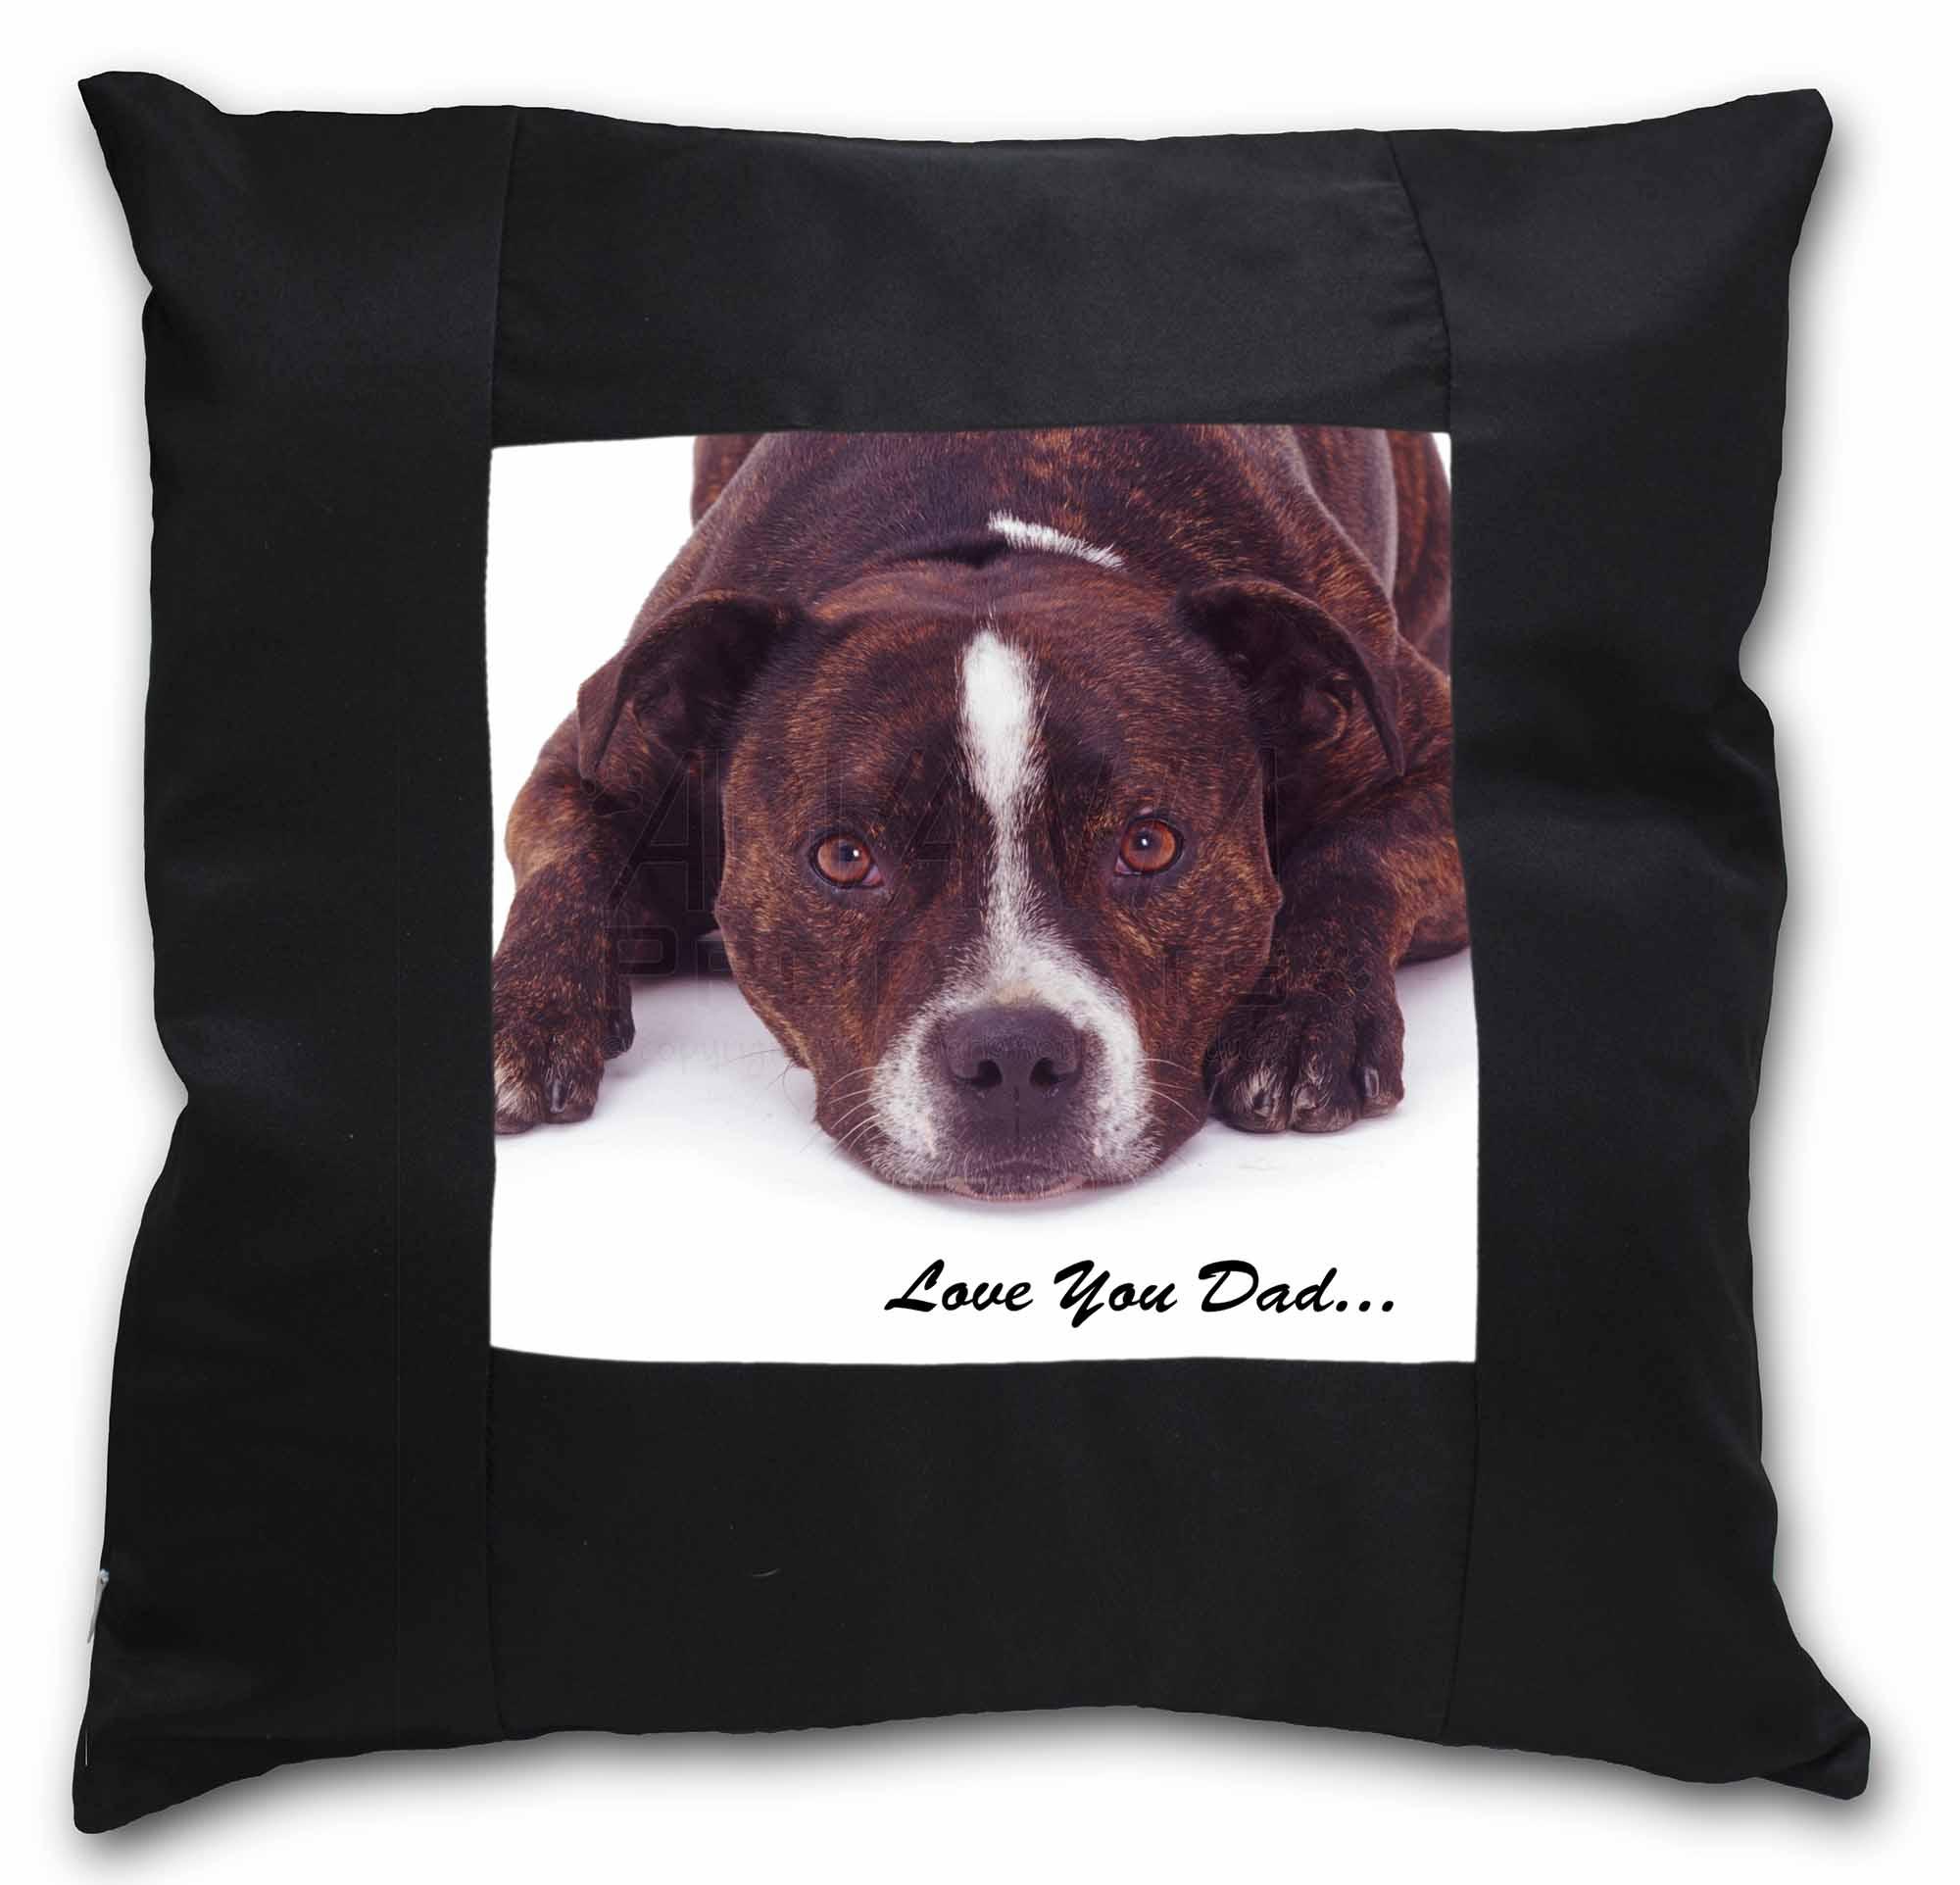 DAD-184-CSB Staff Bull /'Love You Dad/' Black Border Satin Feel Cushion Cover Wit